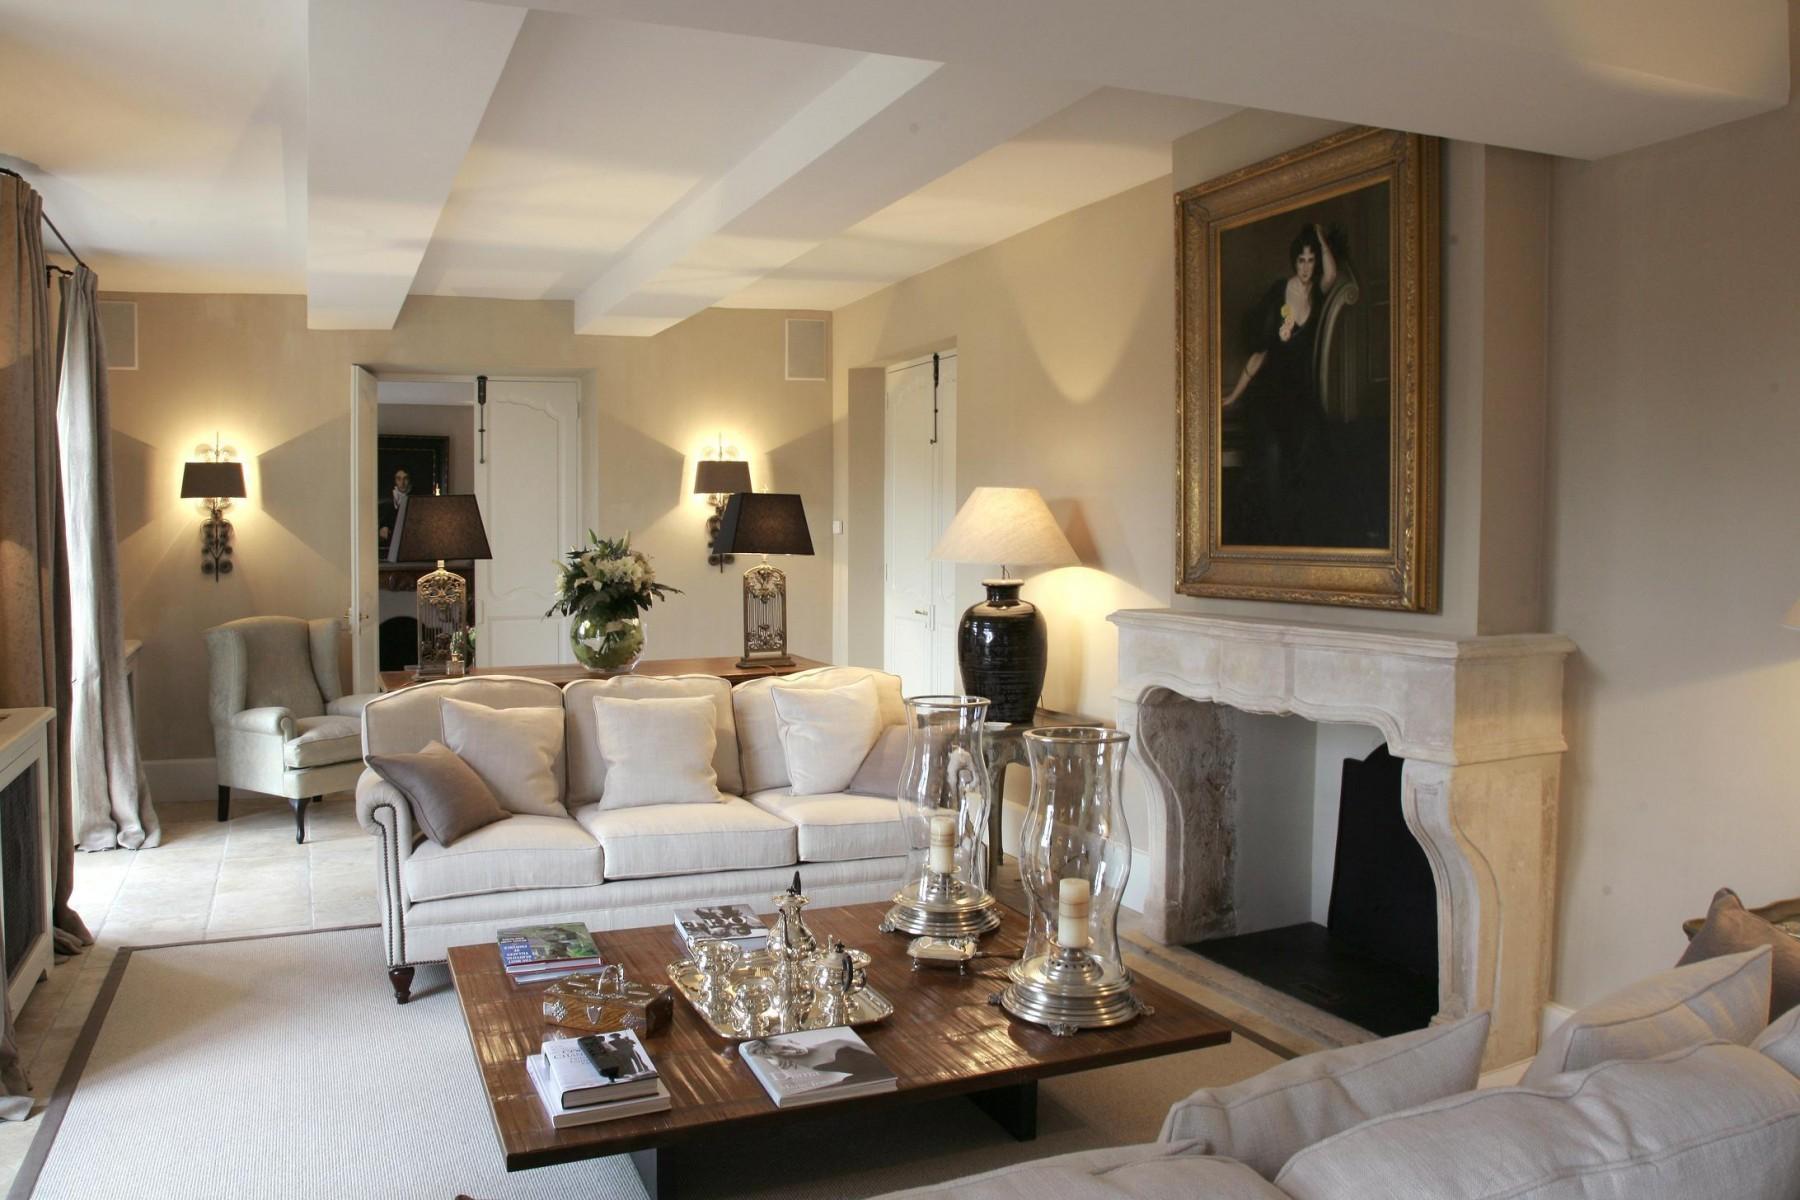 10 trucos para crear casas lujosas con poco dinero hoy - Adornos para casas ...